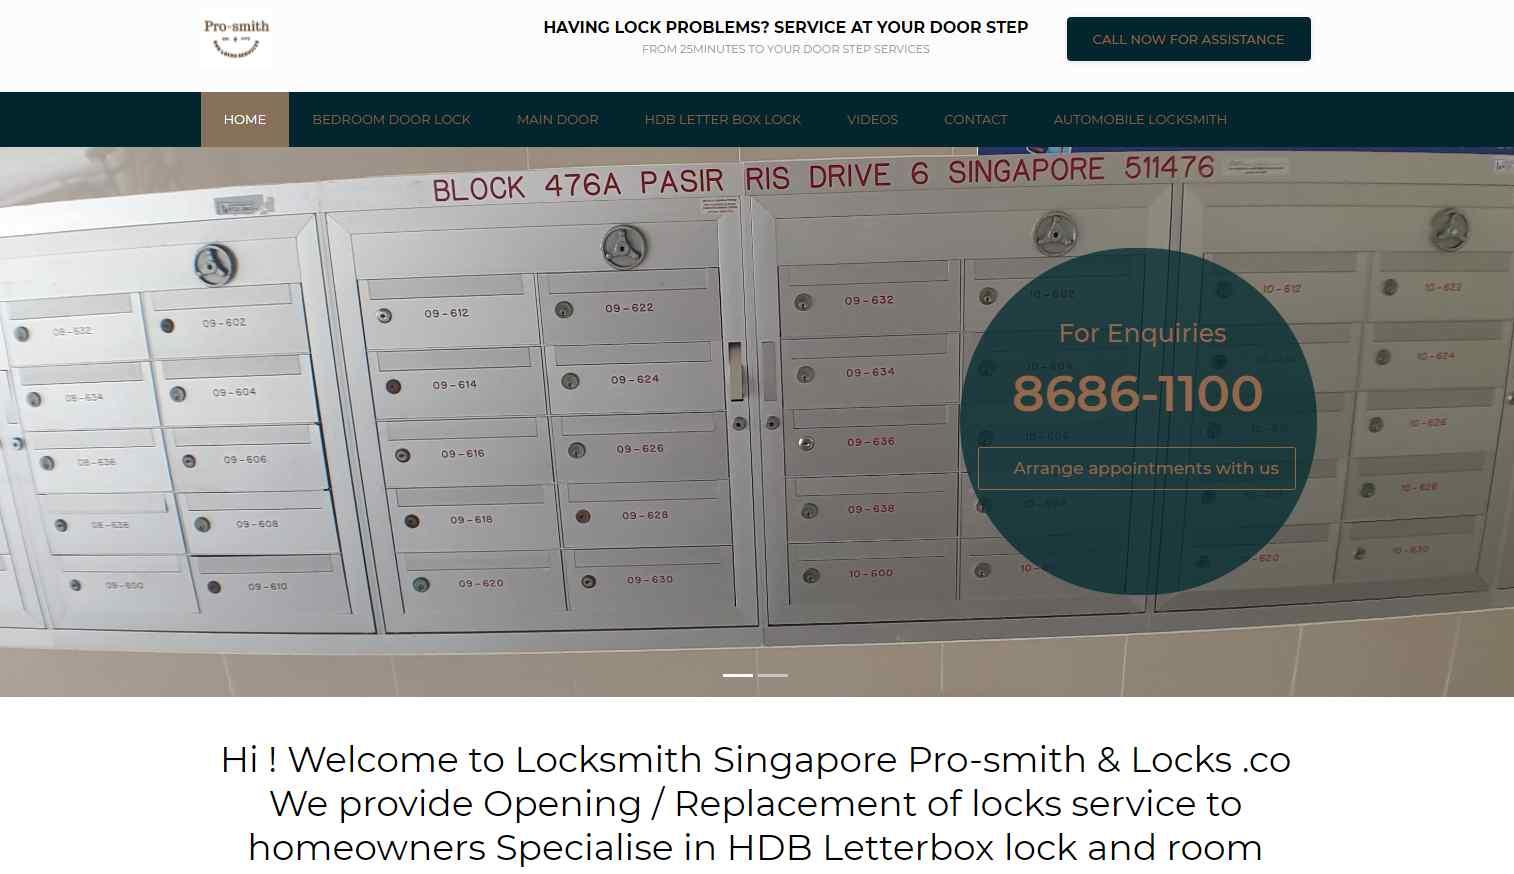 locksmit singapore services Top Locksmiths In Singapore